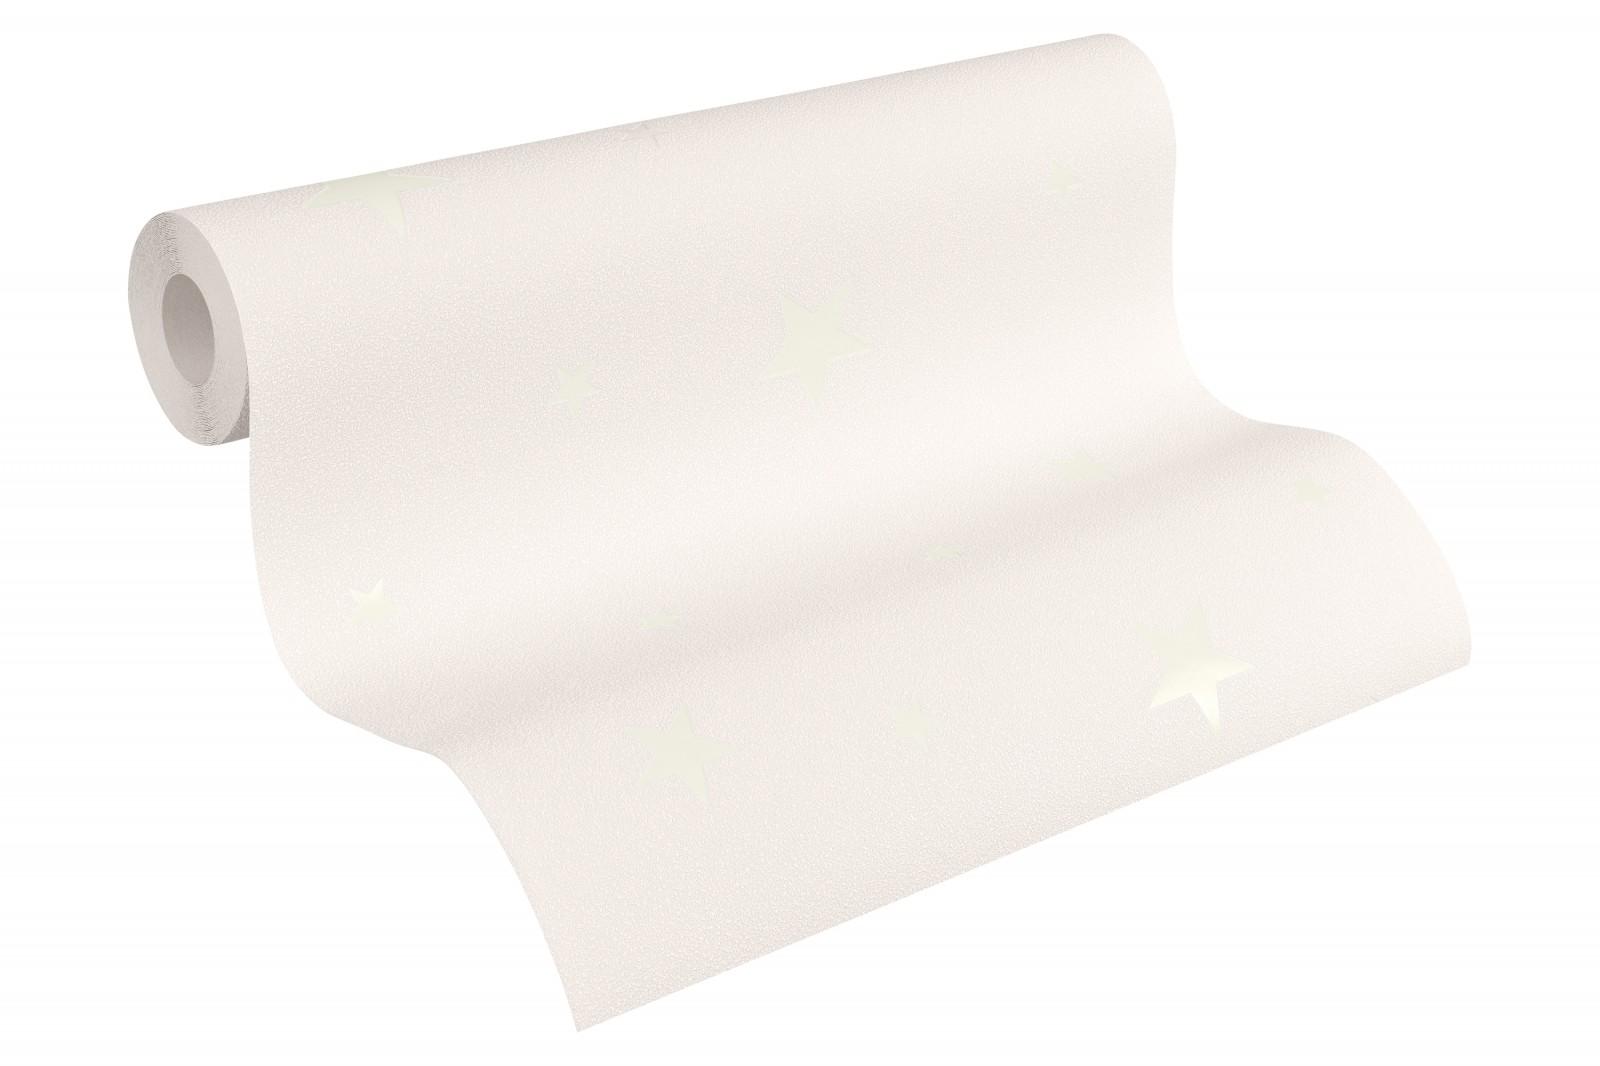 tapete leuchttapete fluoreszierend sterne beige 32440 4. Black Bedroom Furniture Sets. Home Design Ideas